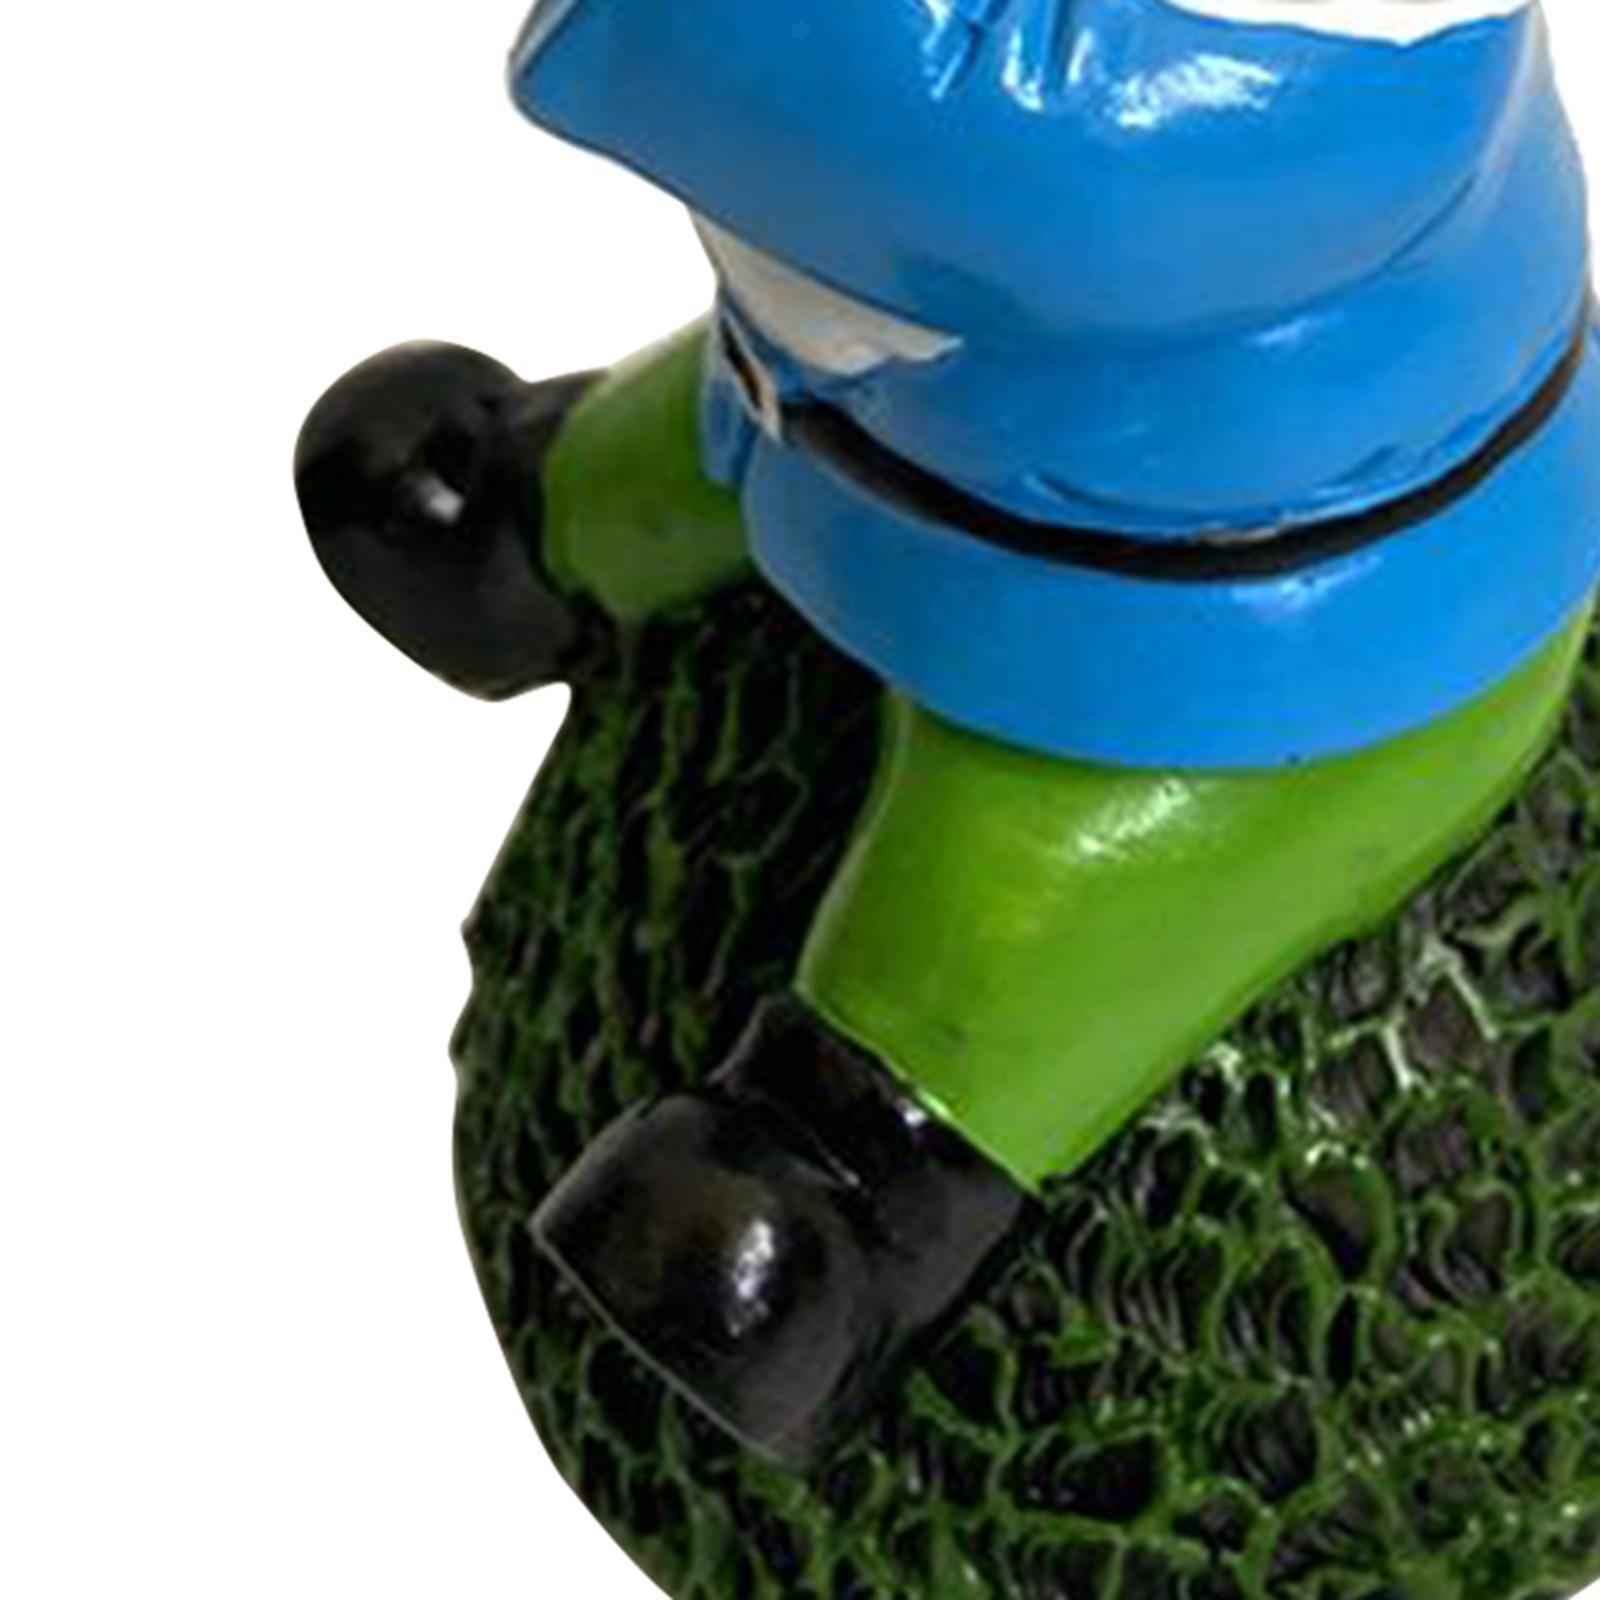 thumbnail 21 - Funny Resin Naughty Garden Gnome Statue Ornaments Villa Home Figurines Decor AU